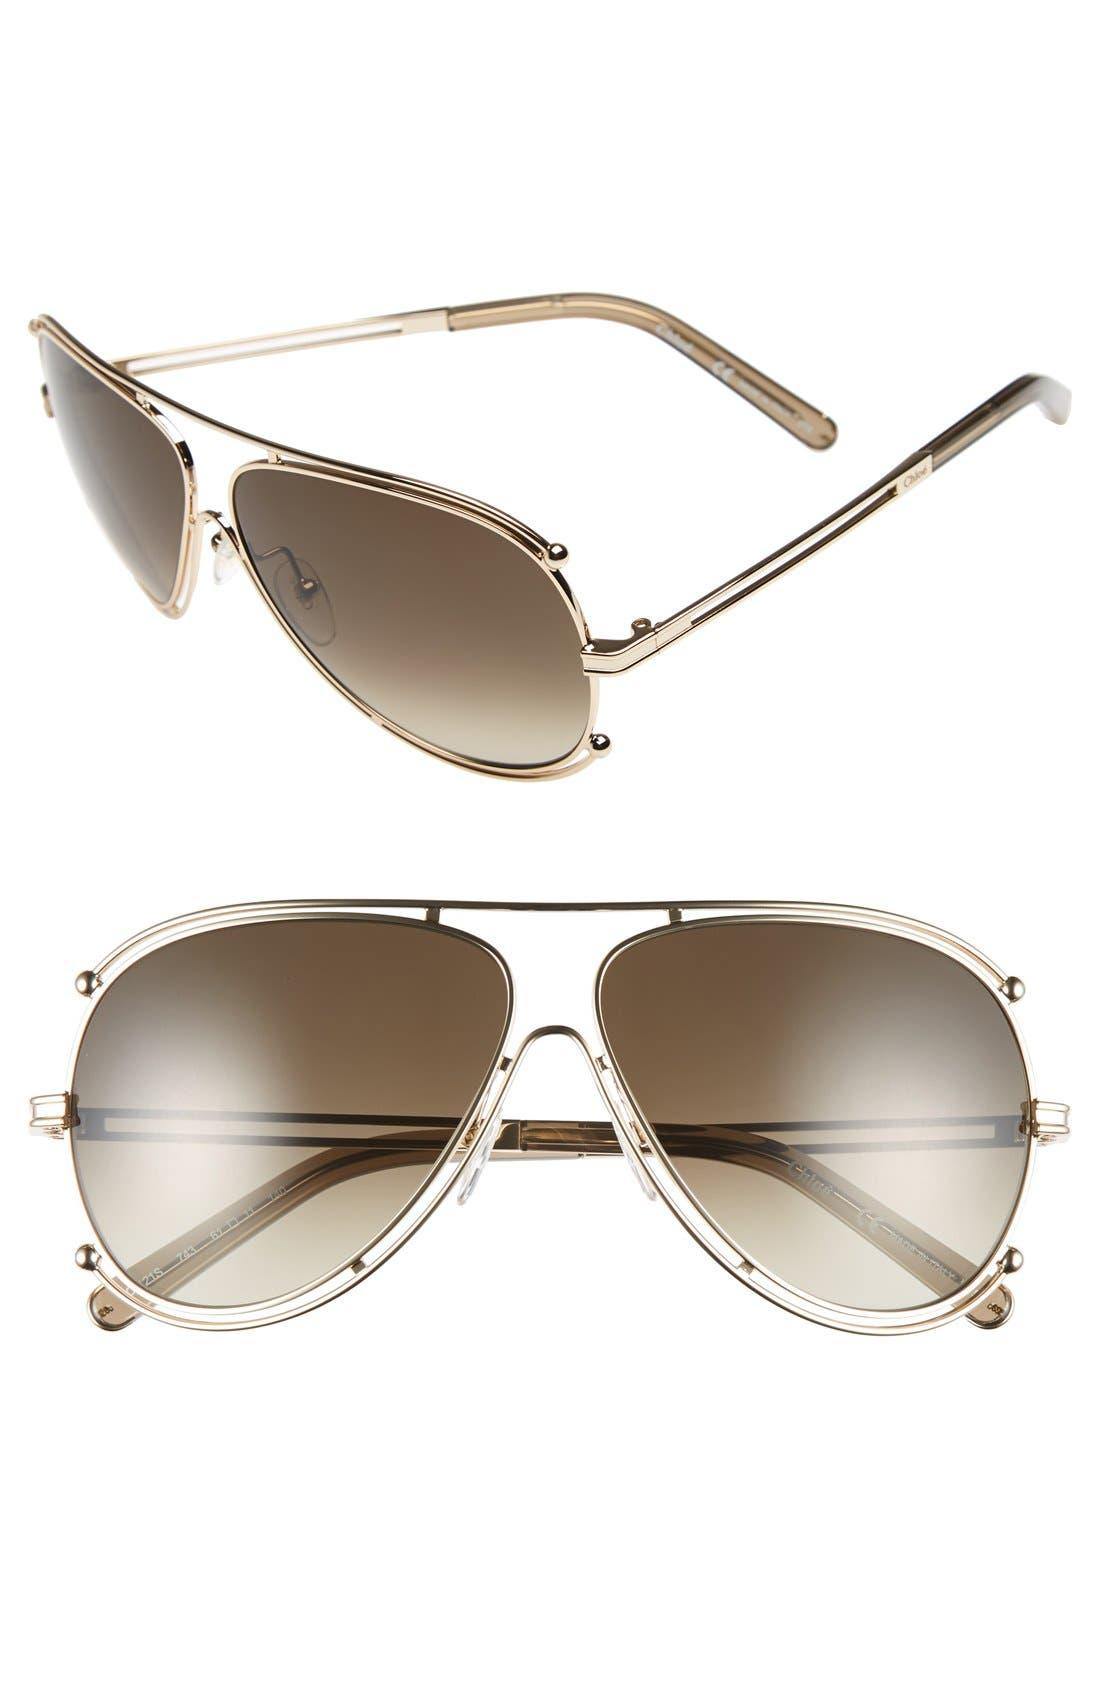 CHLOÉ,                             'Isidora' 61mm Aviator Sunglasses,                             Main thumbnail 1, color,                             710